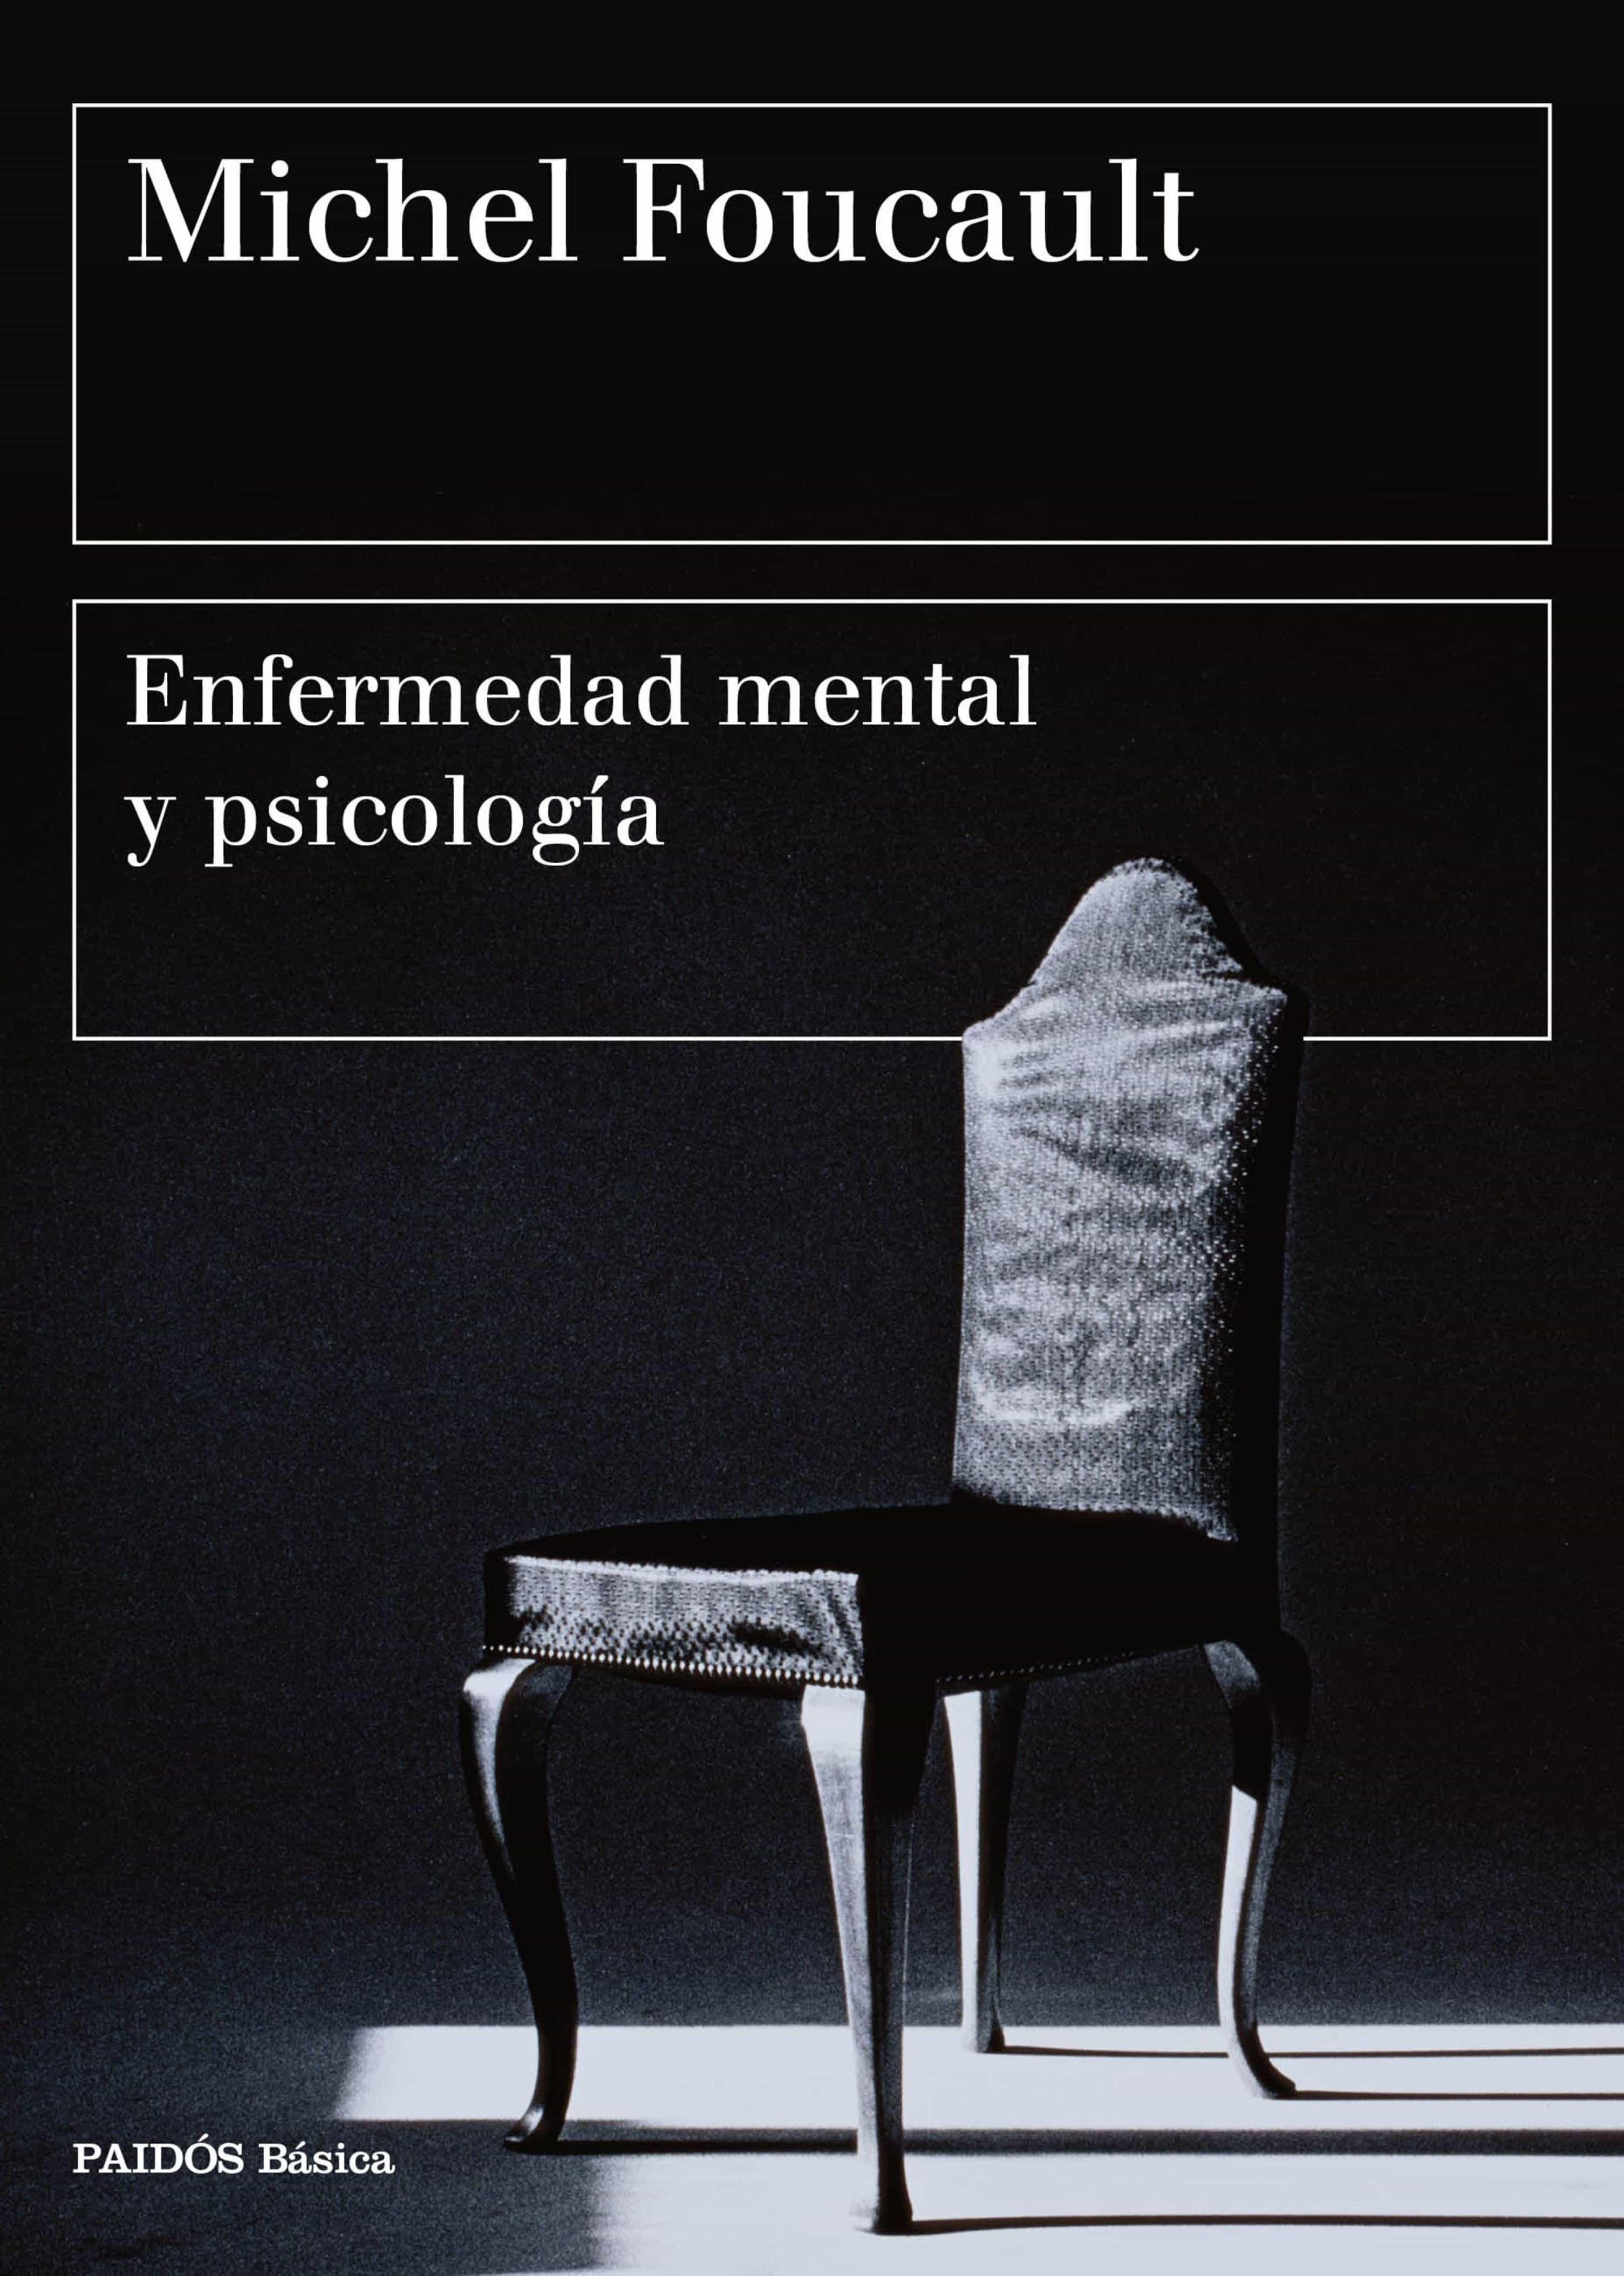 Michel Foucault Pdf